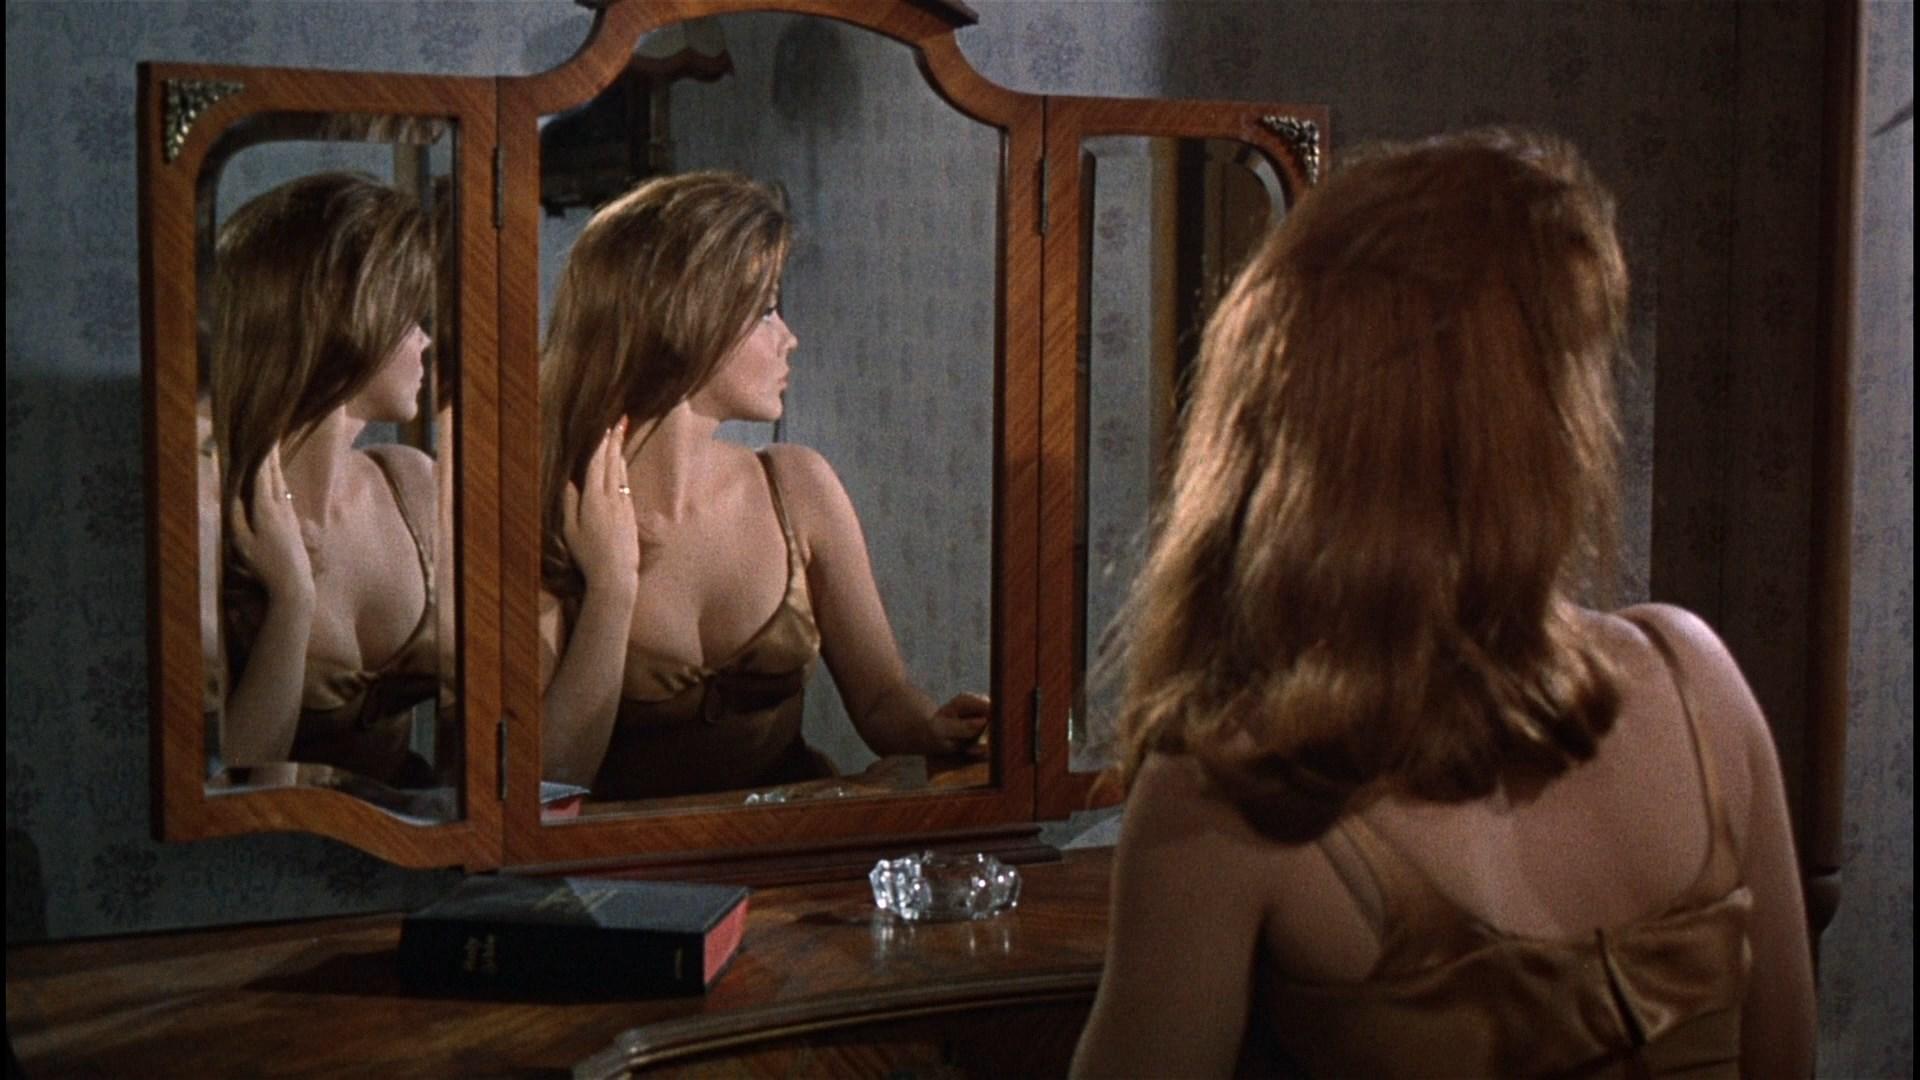 Joan weldon actress nude gallery my hotz pic